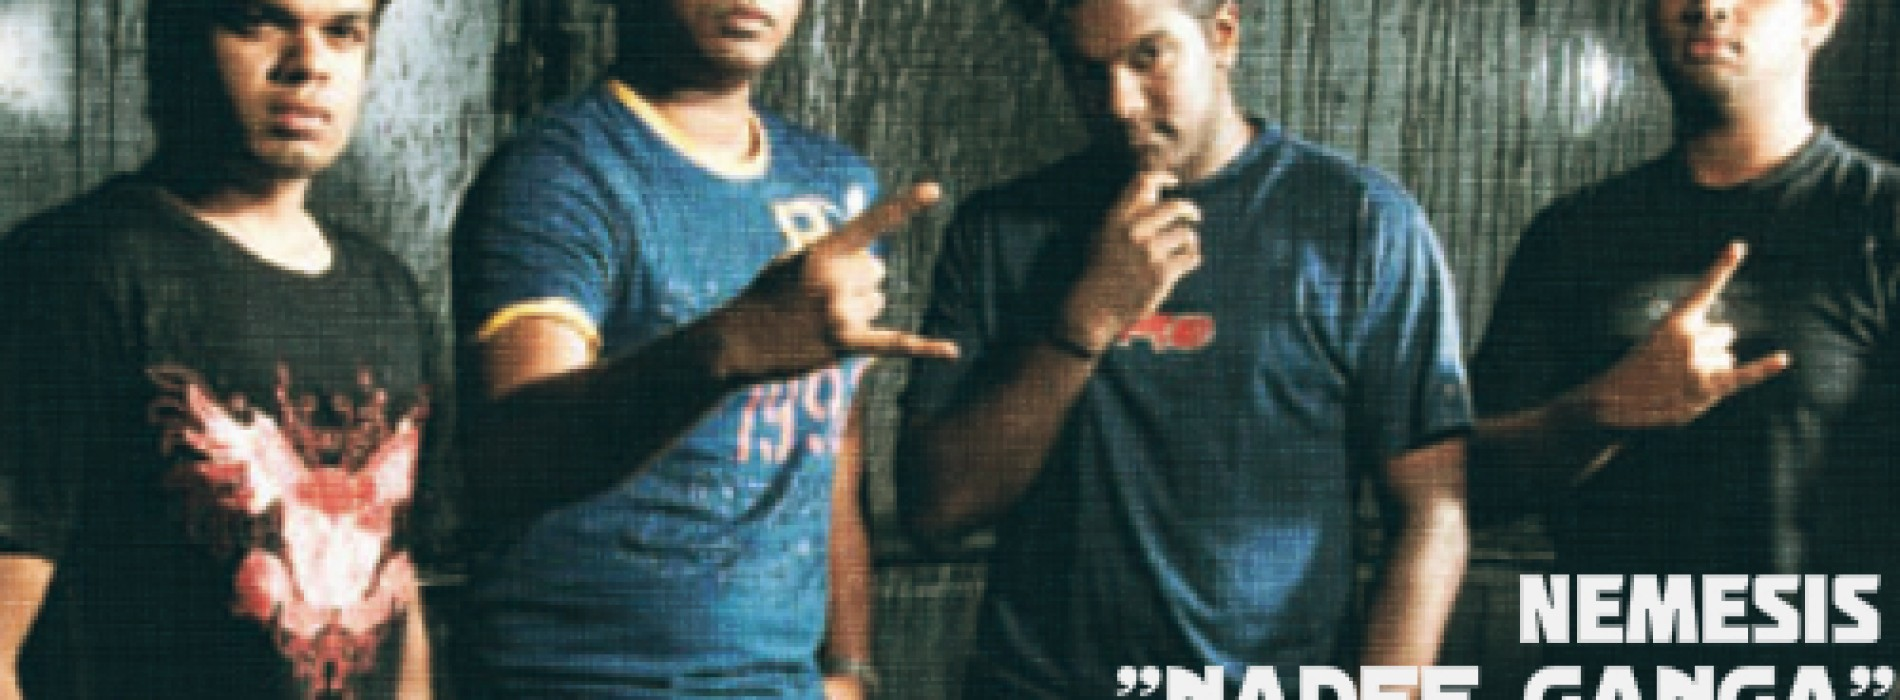 Throwback Thursday: Nadee Ganga By Nemesis